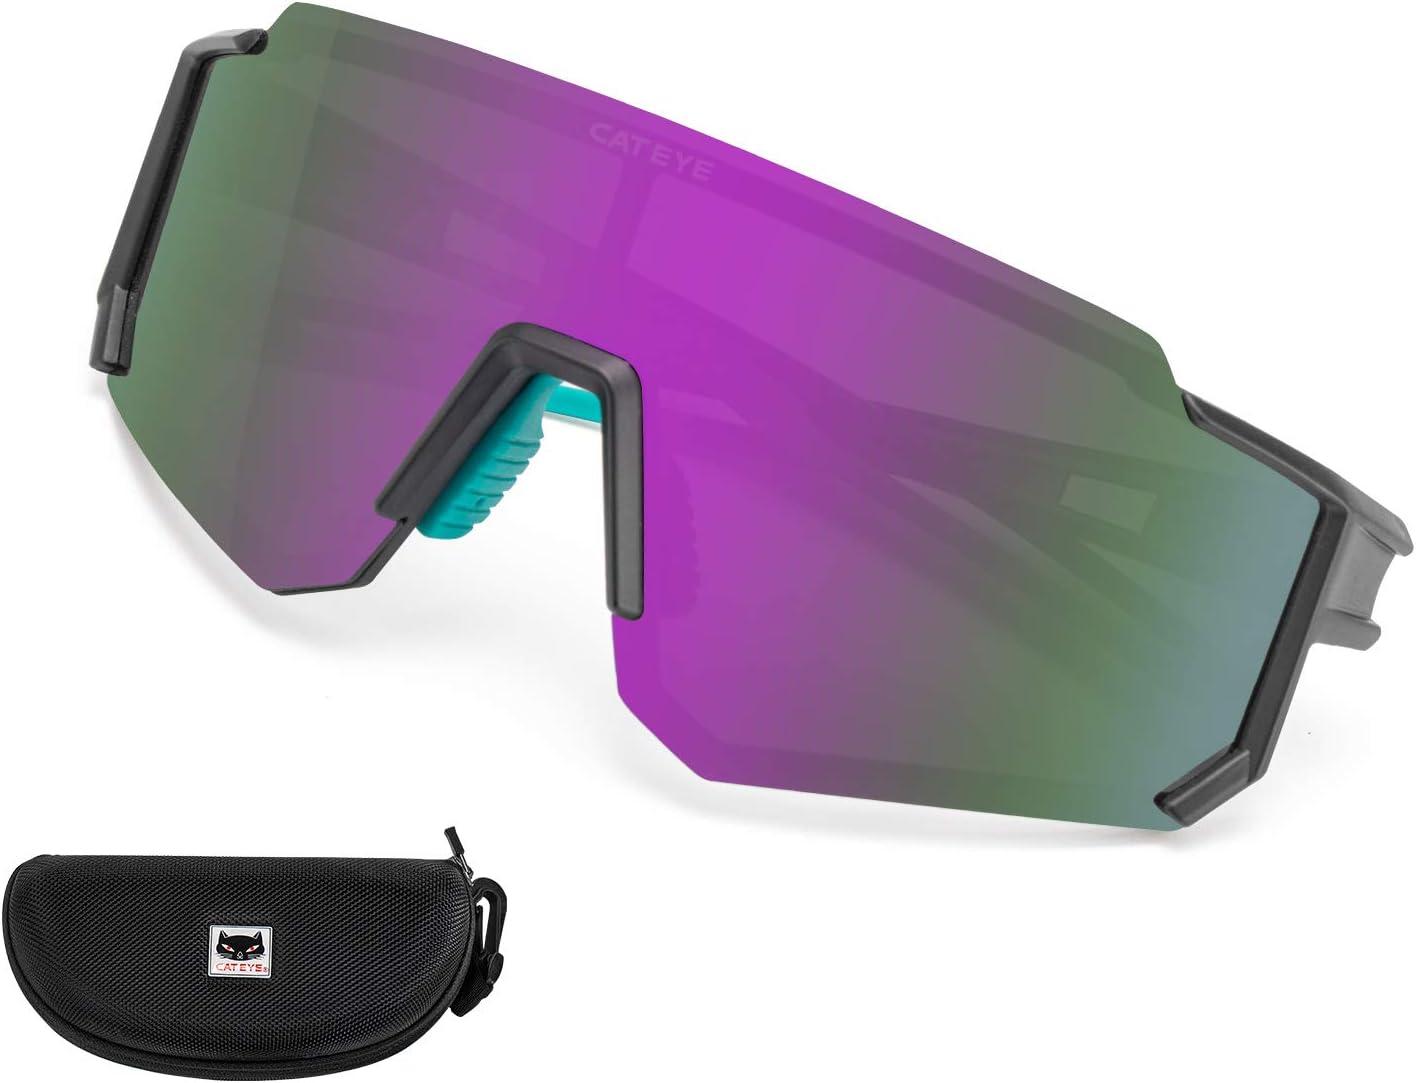 ROCKBROS Polarized Sunglasses for Men Women Frame Cycling Glasses Sport Sunglasses UV400 Protection Bike Sunglasses